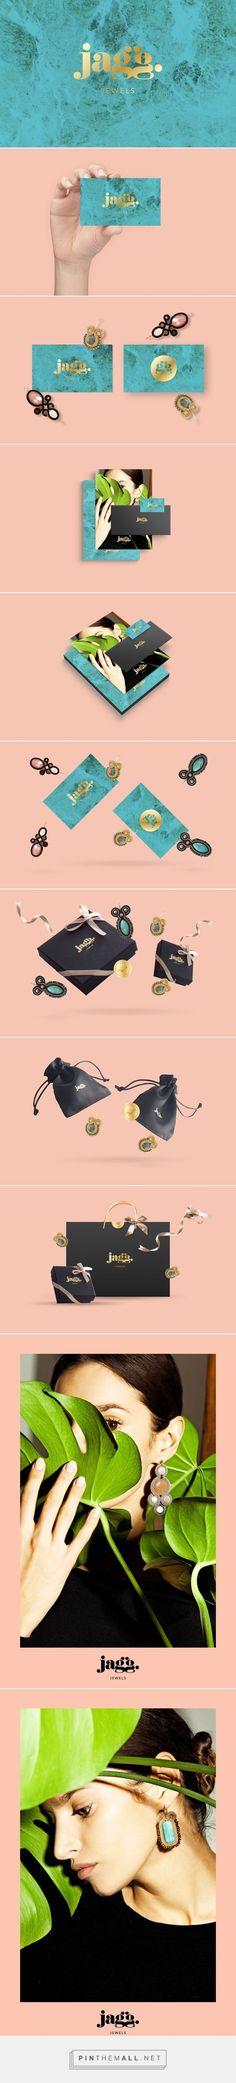 Jagg. Jewels Branding by Lange & Lange